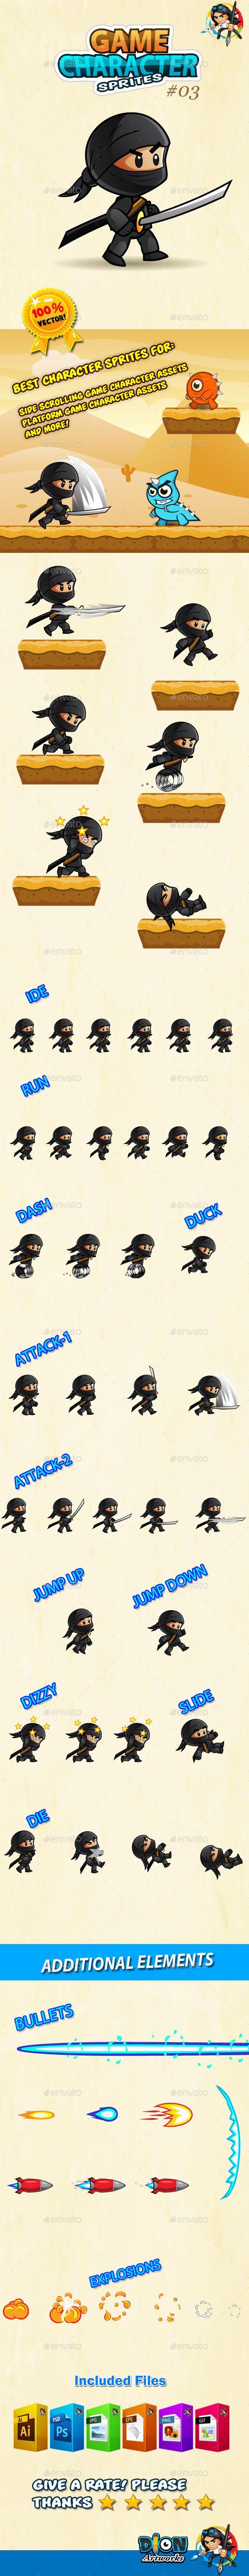 GraphicRiver Ninja Character Sprites 03 10657777